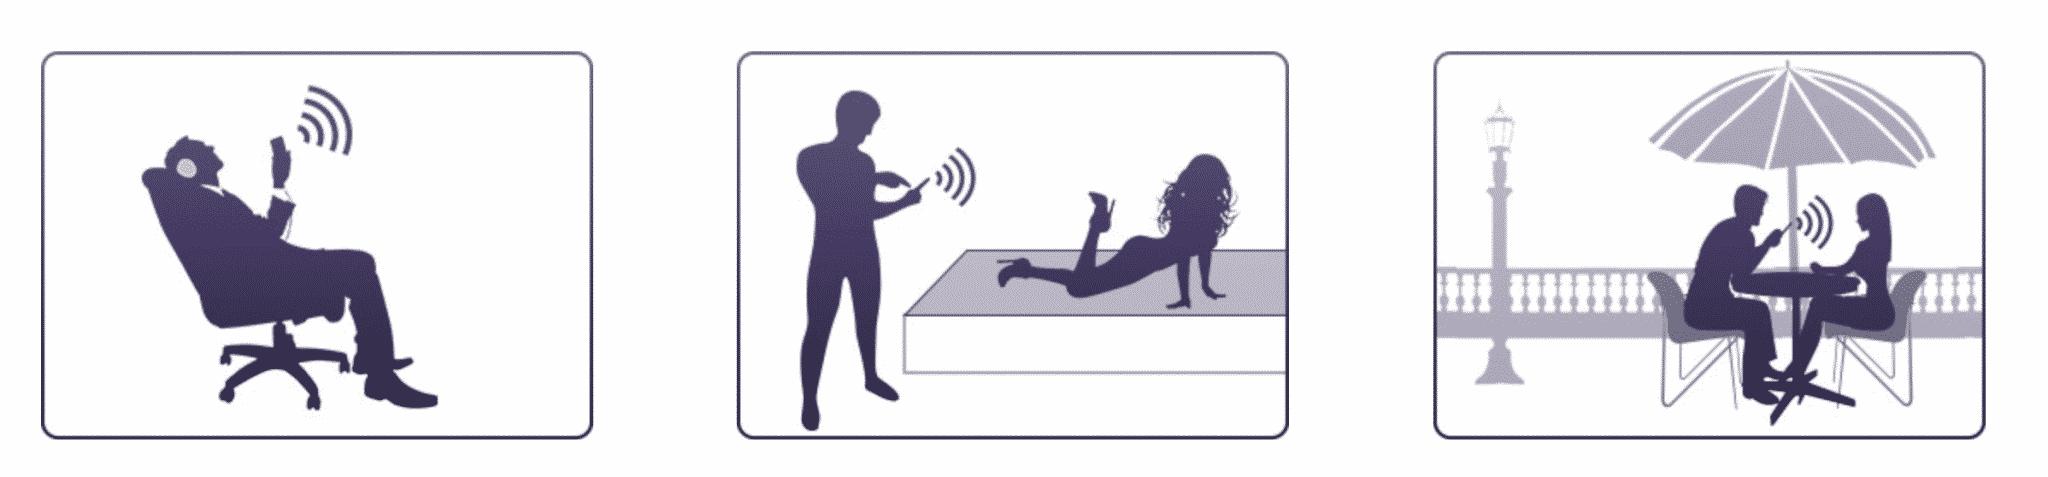 Teknologin i sexleksaksindustrin